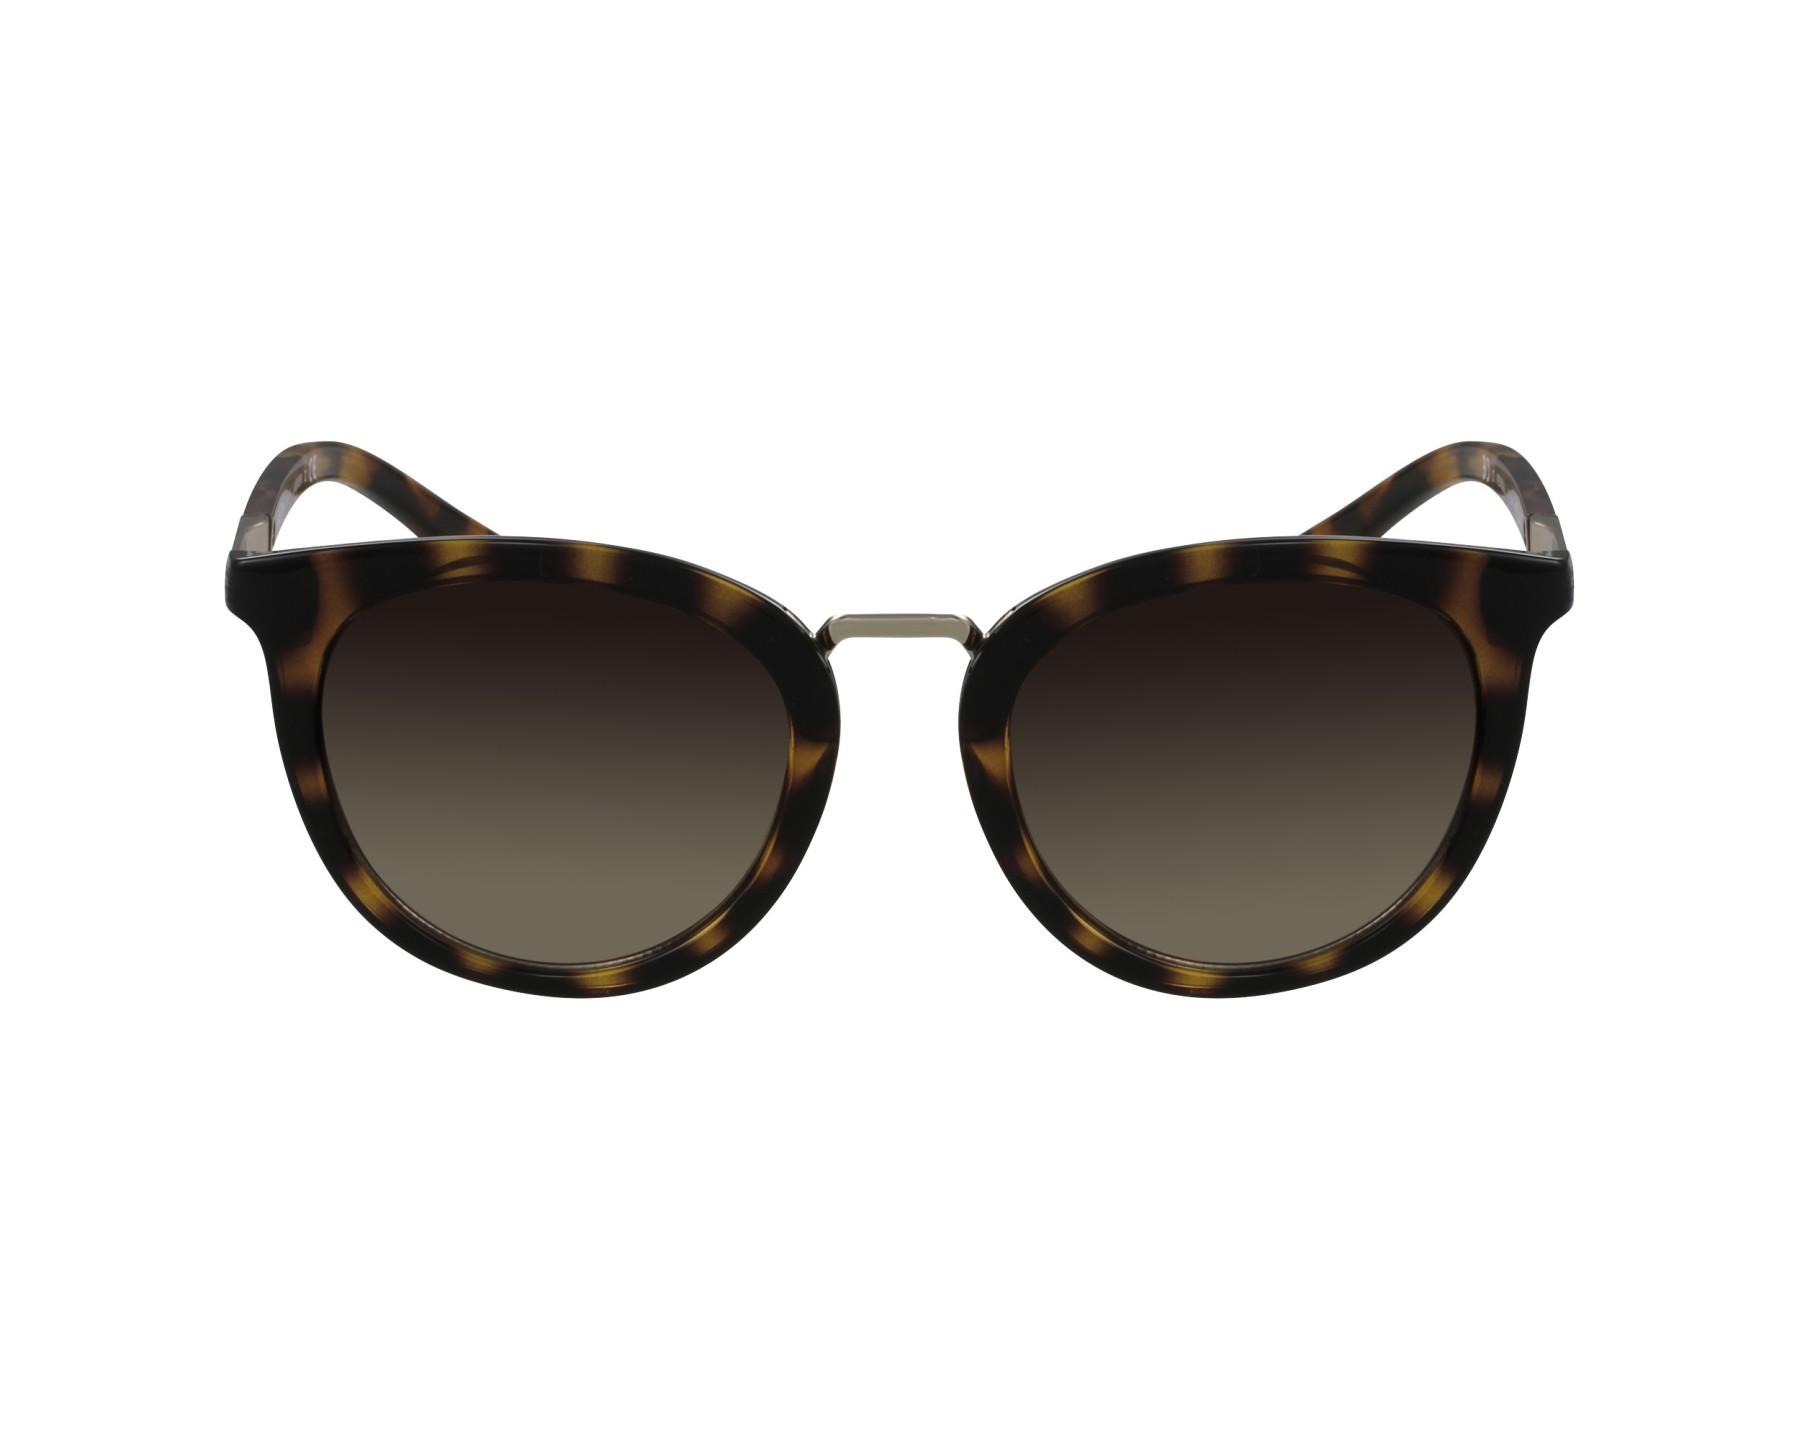 Sunglasses Ralph by Ralph Lauren RA-5207 150613 52-21 Havana profile view 66d28758db94